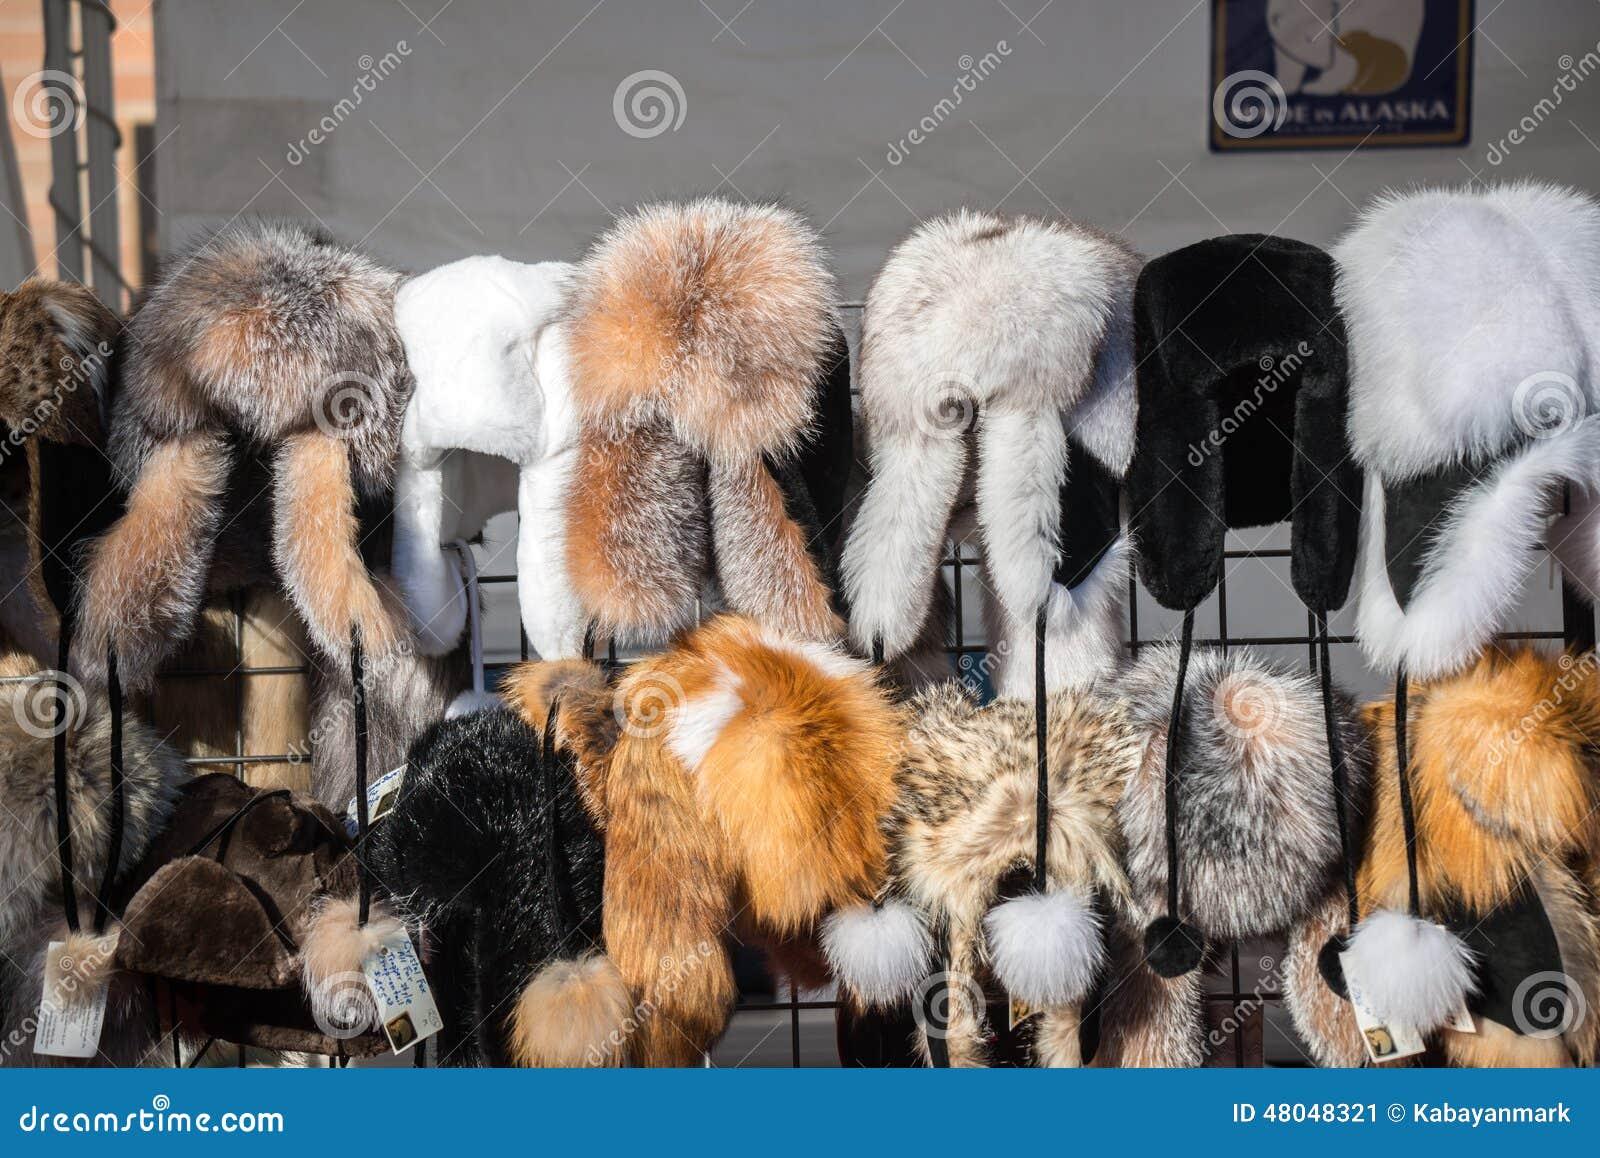 Fur rondy - fur hats for sale in alaska